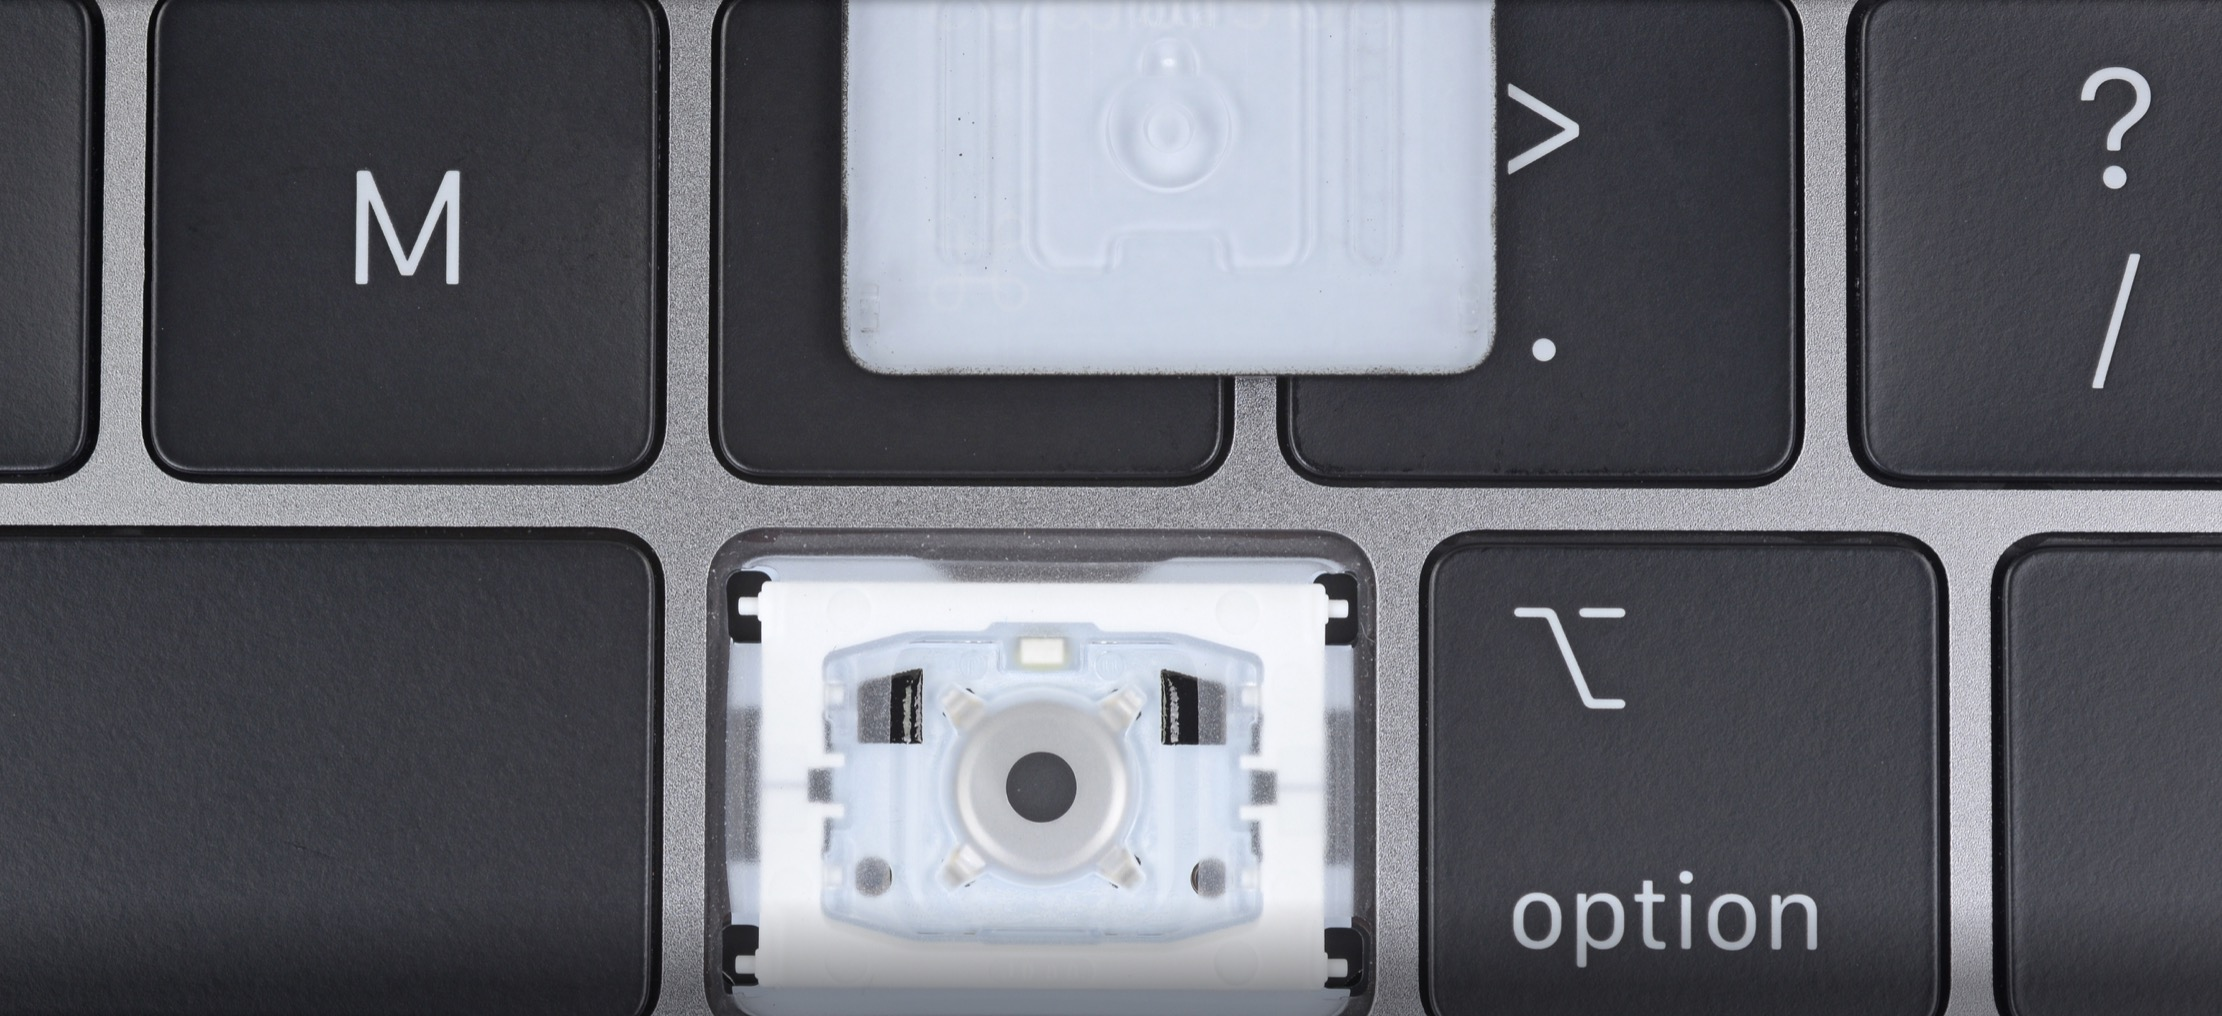 new product c42fe e5d8f Apple won't repair 2016-2017 MacBook Pros with 'quieter' 2018 ...